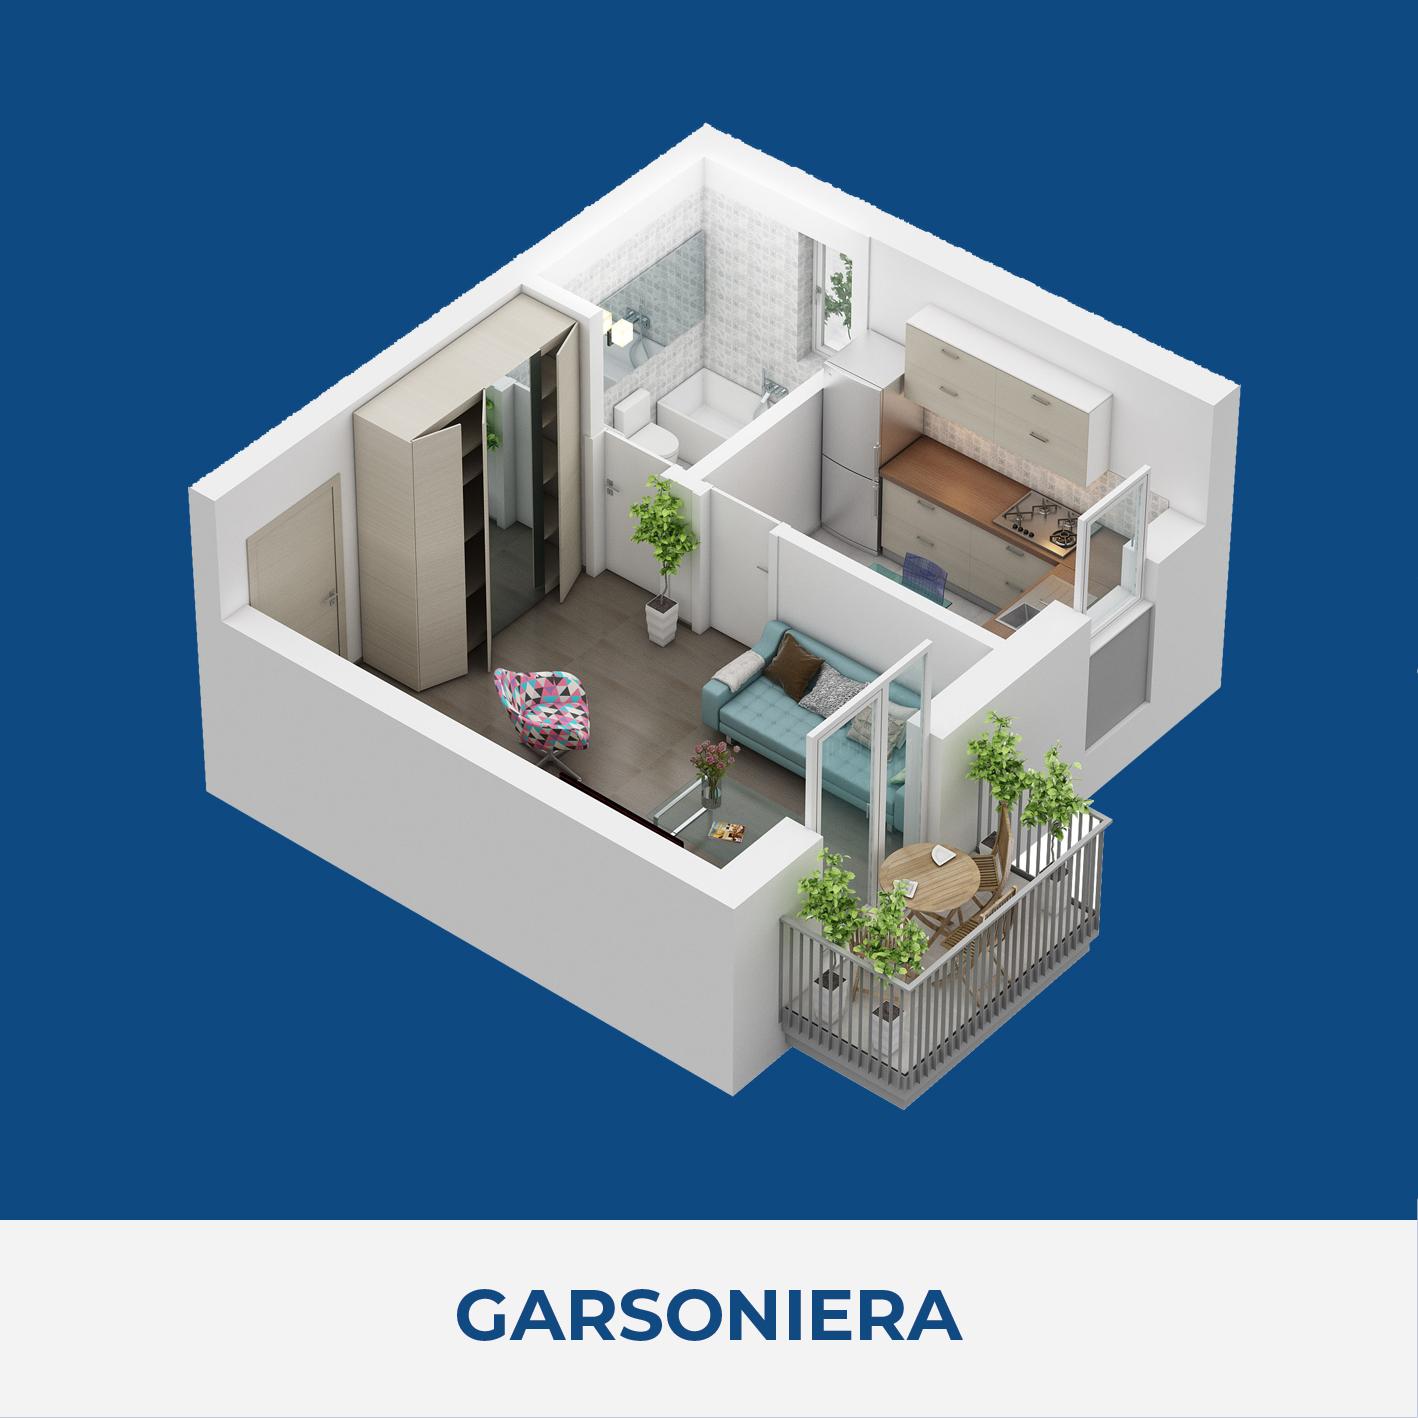 garsoniera-01-01